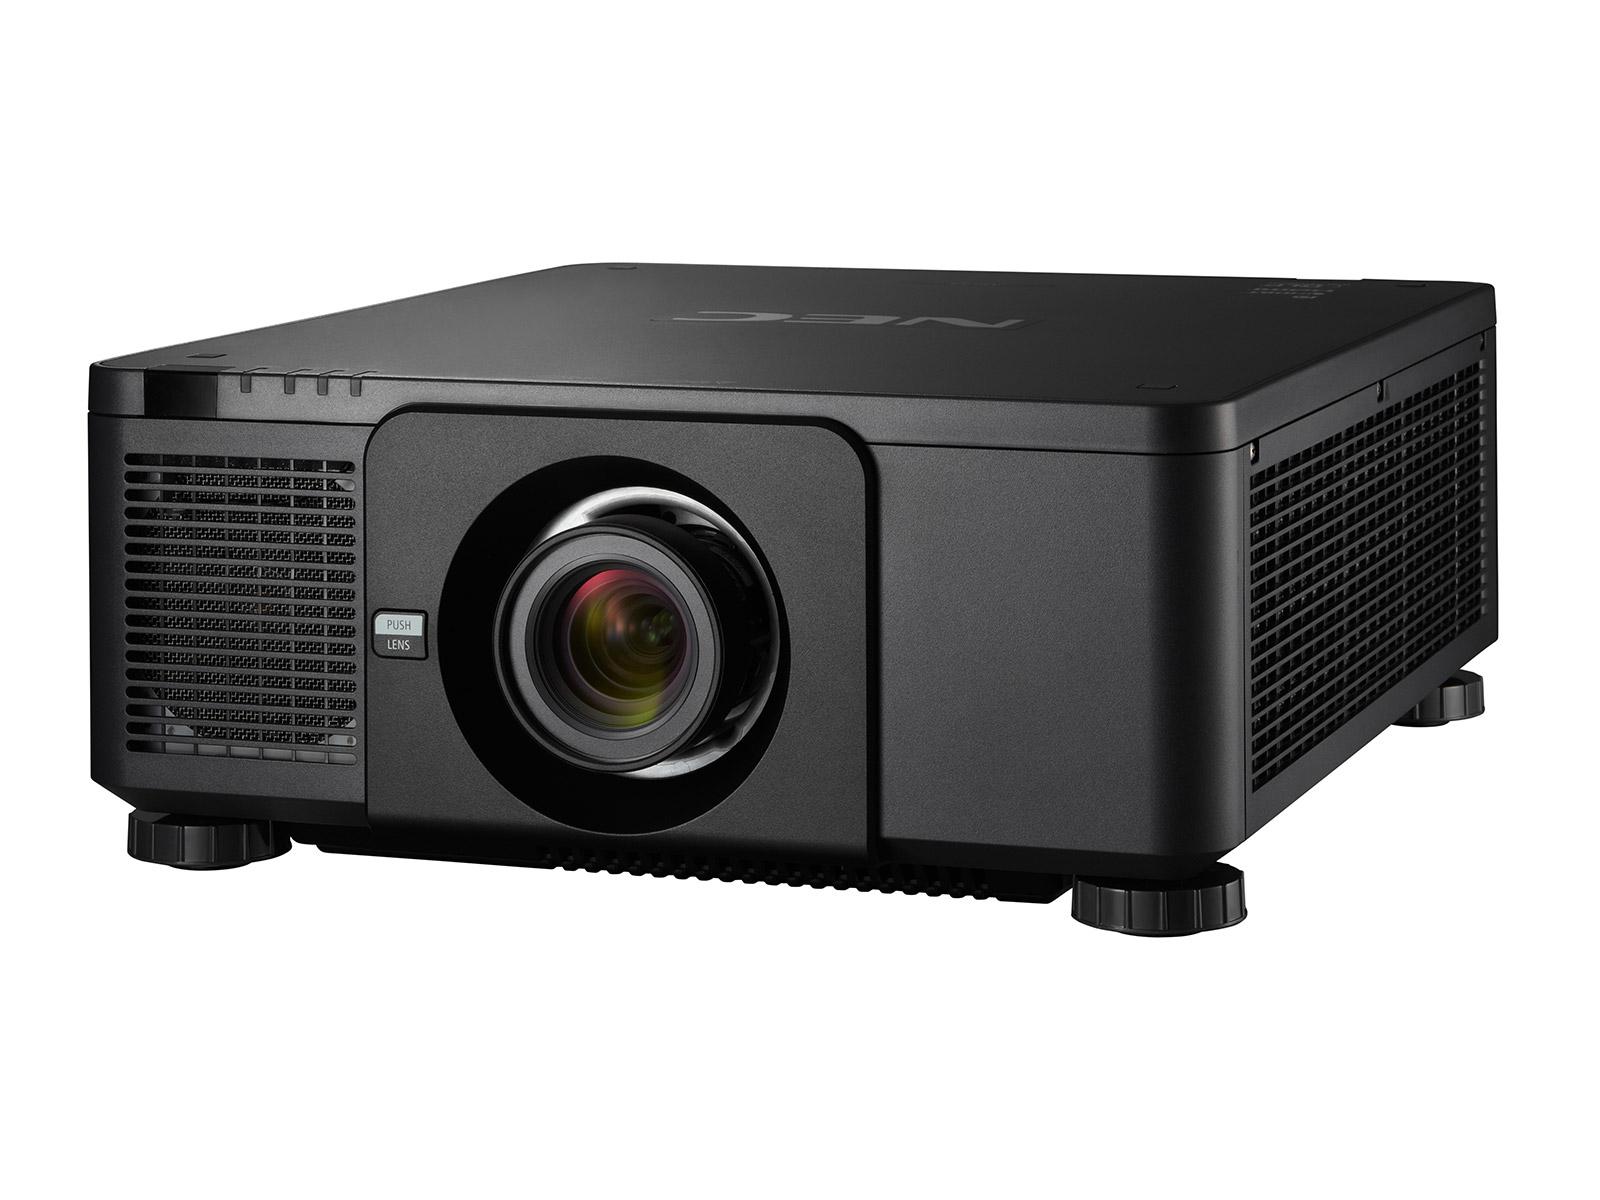 NEC PX1004UL Desktop projector 10000ANSI lumens DLP WUXGA (1920x1200) Black data projector